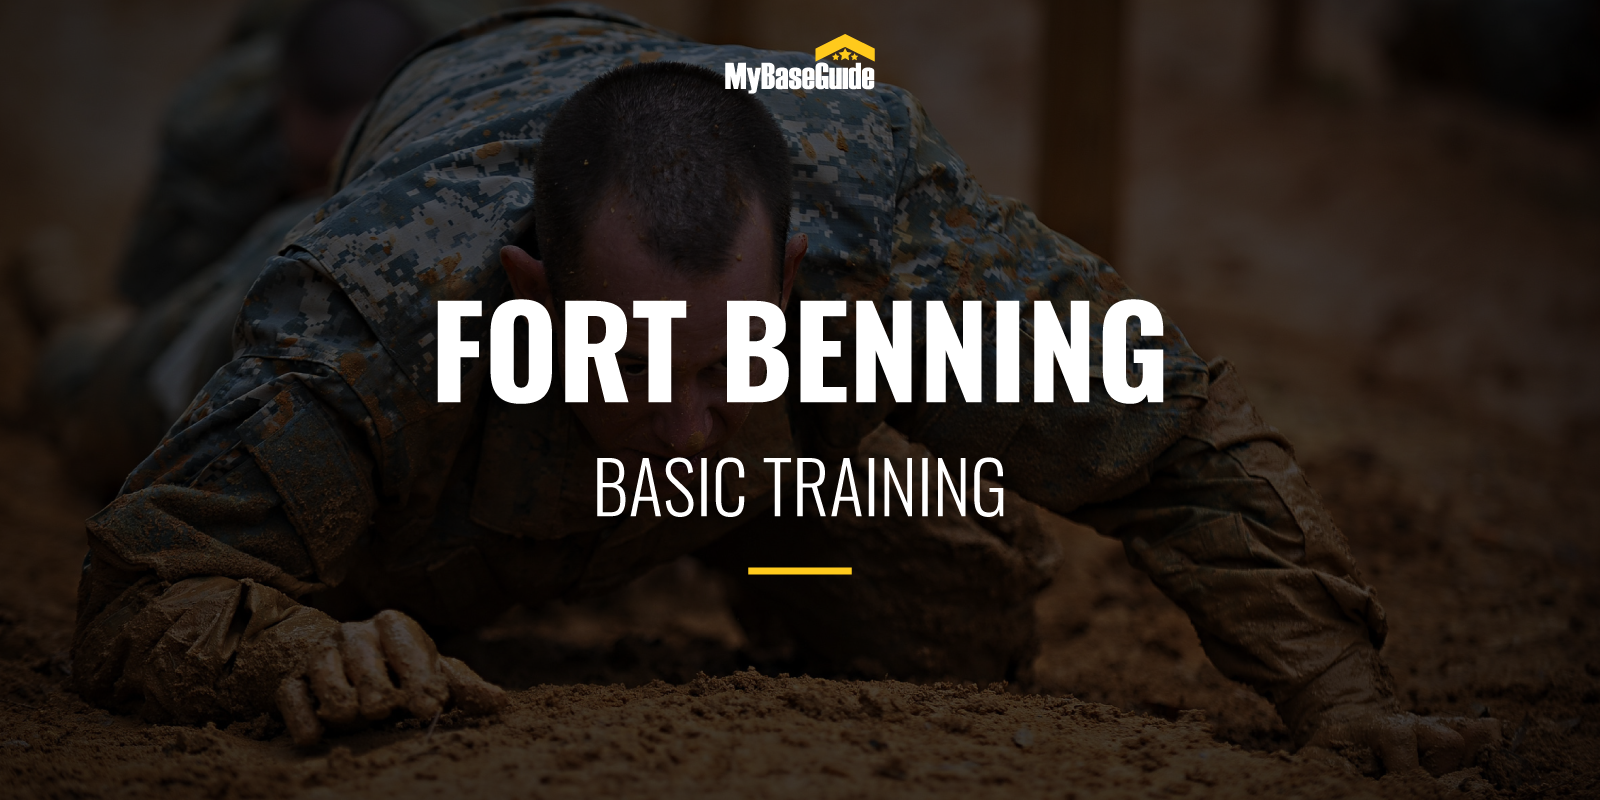 Fort Benning Basic Training